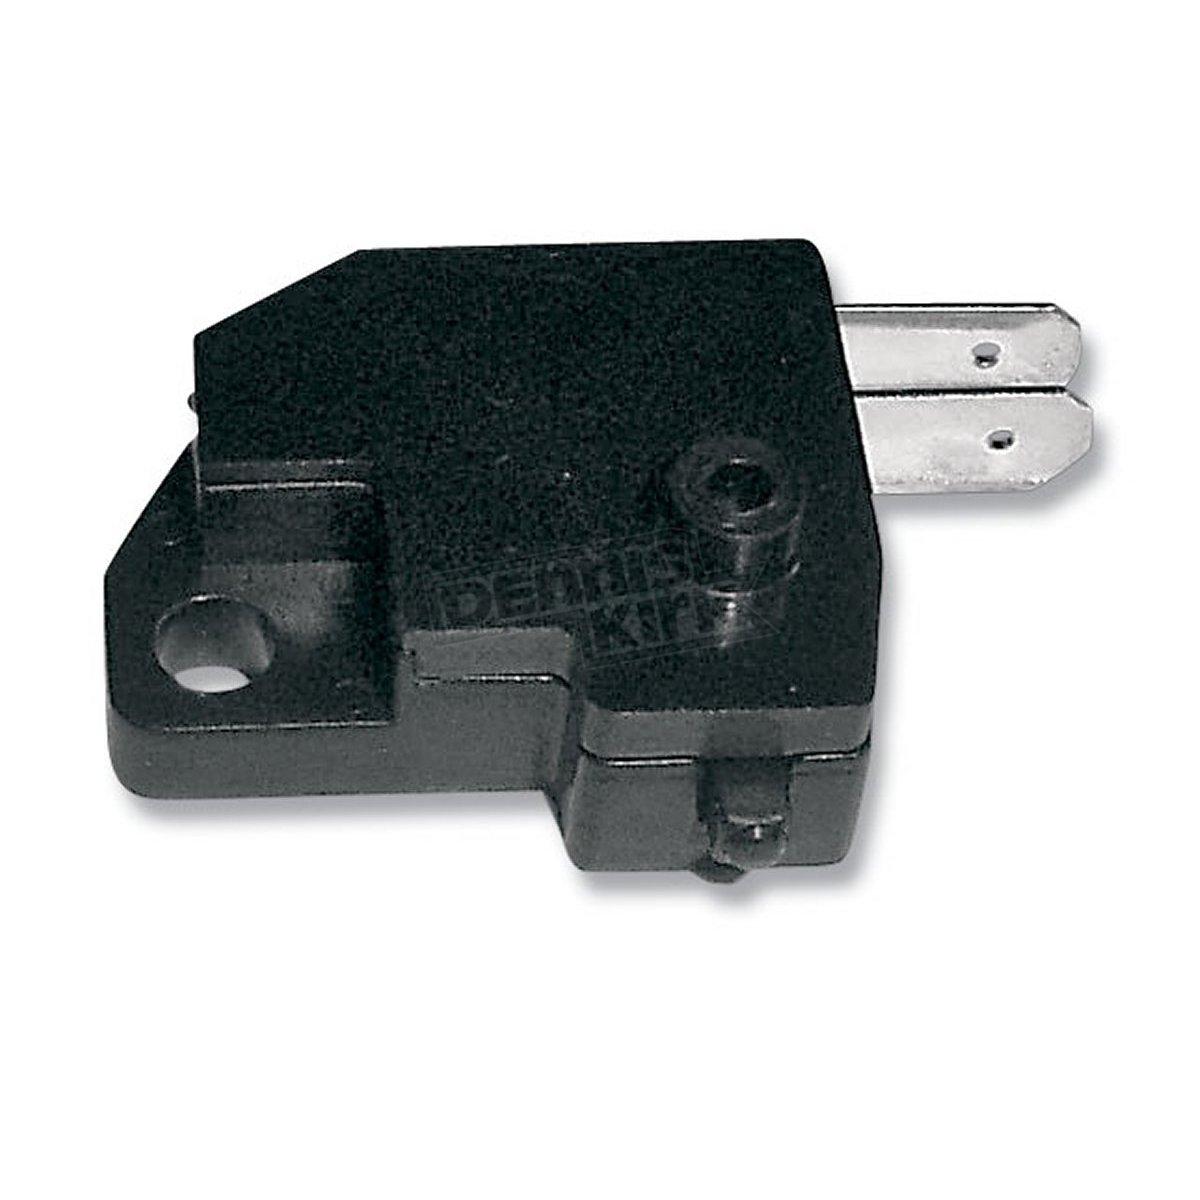 hight resolution of k s front brake light switch for kawasaki and suzuki 12 0005